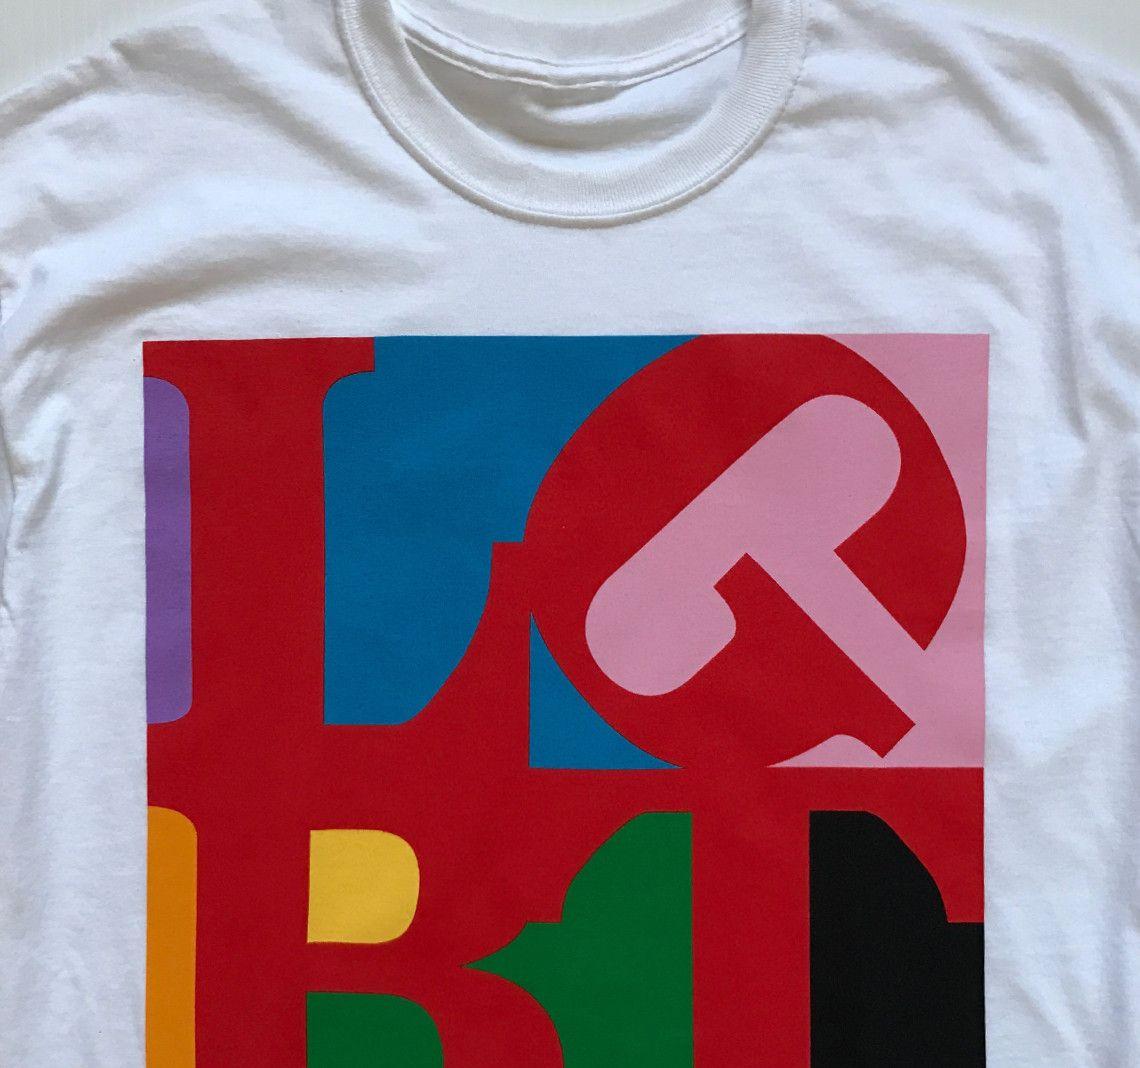 f168f39a276 Unisex LGBT LOVE T-Shirt - White - T-Shirts - Revel   Riot Online ...